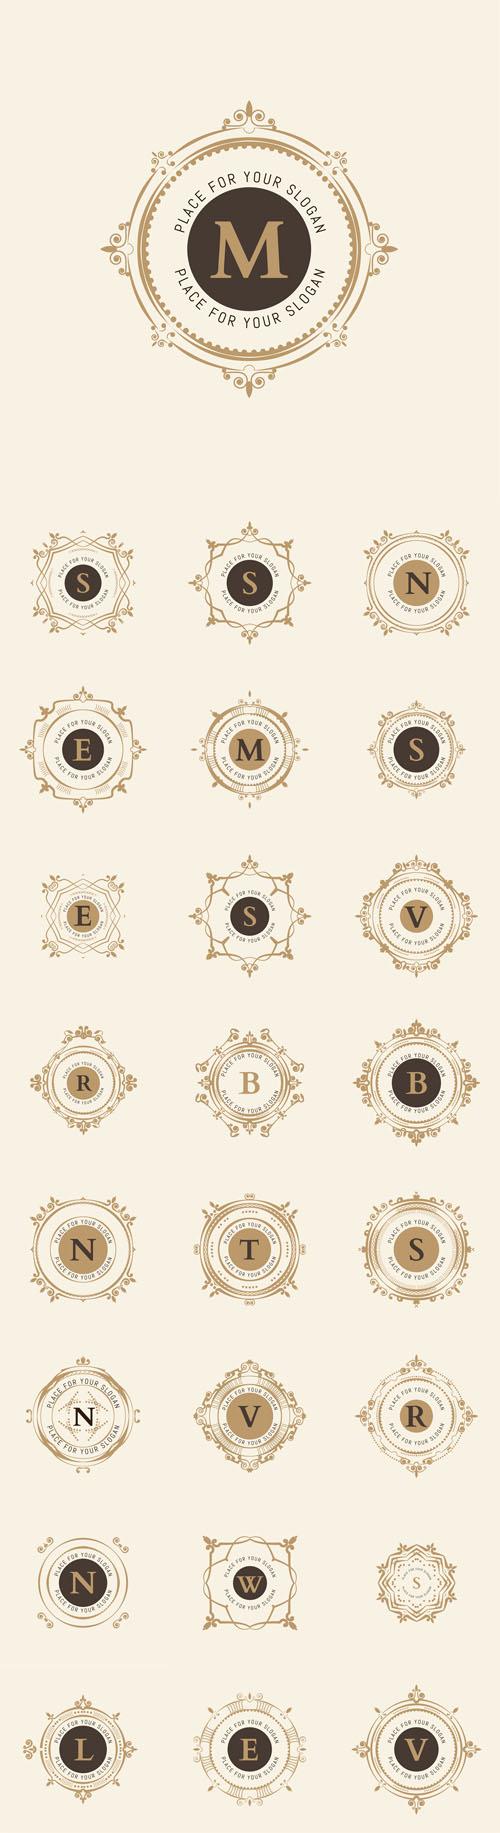 Vector The letters. Flourishes Calligraphic Monogram Emblem Templates